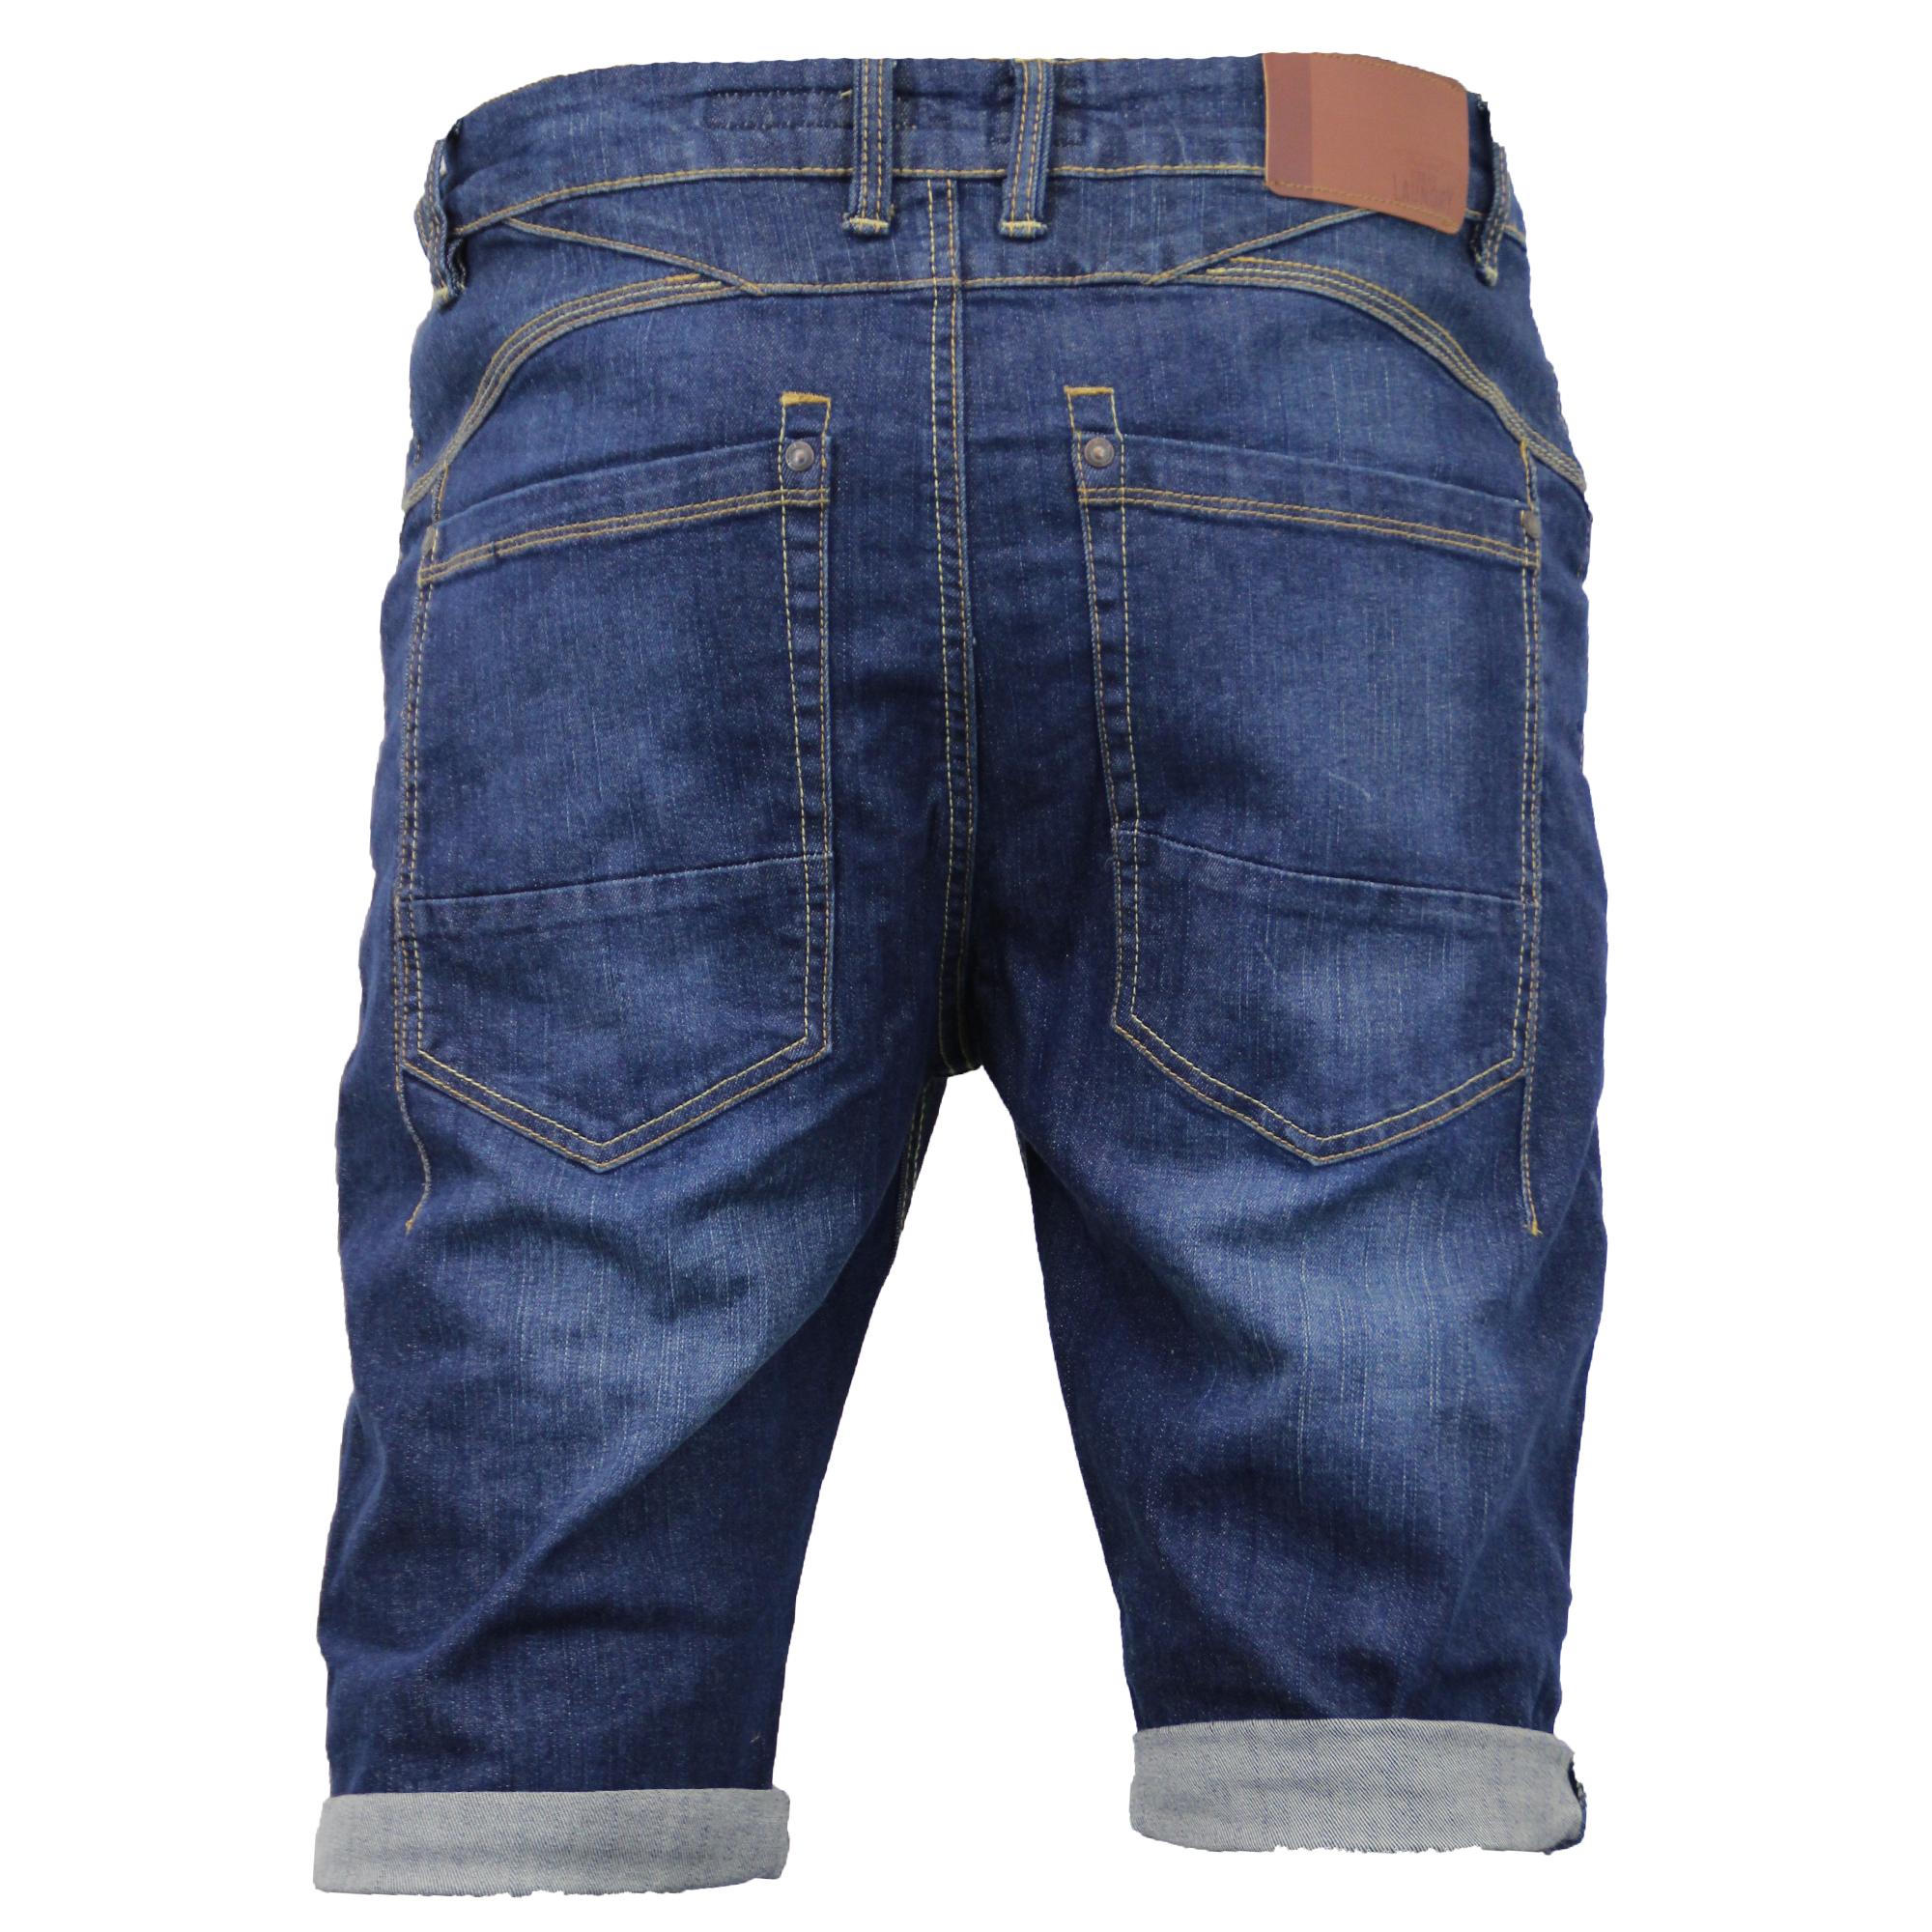 Mens Denim Shorts Tokyo Laundry Jeans Bottoms Roll Up Knee ...